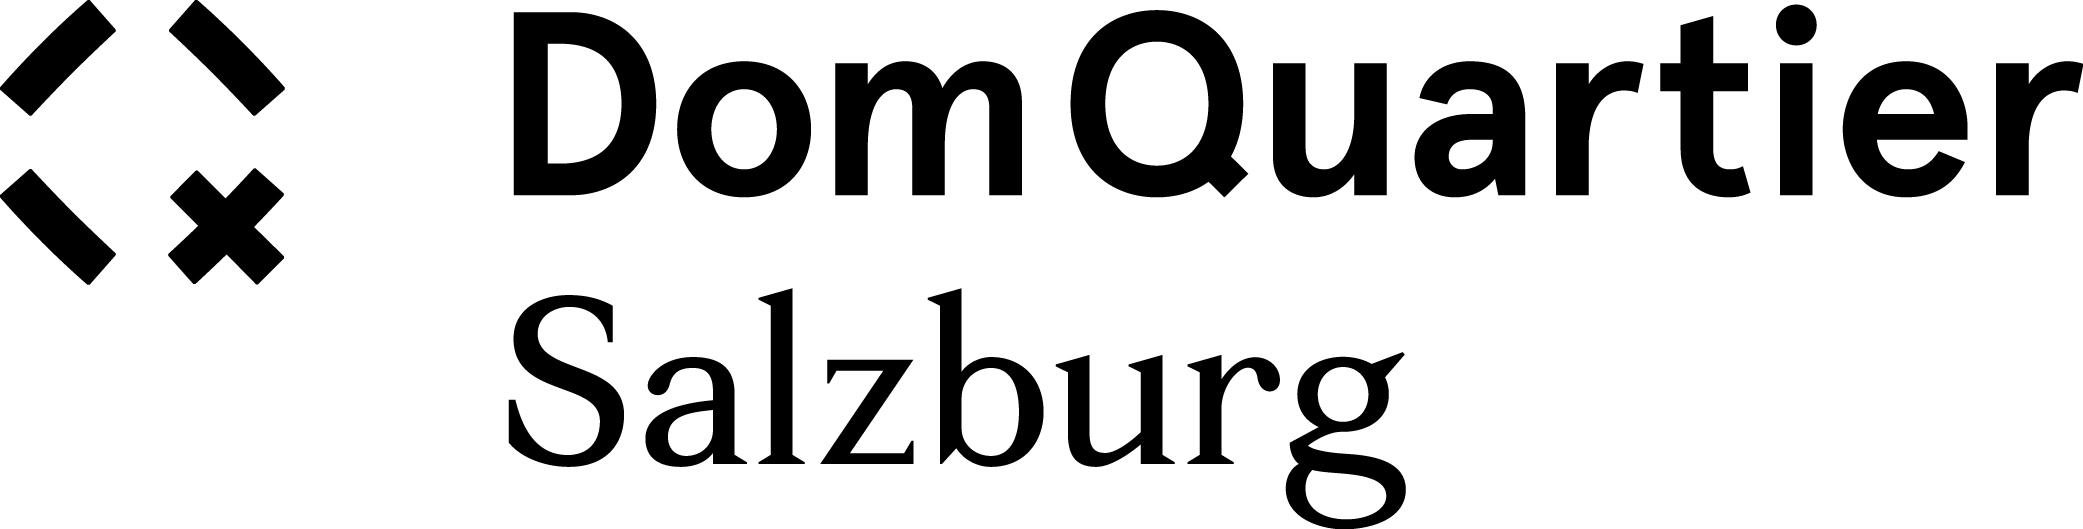 DomQuartier_Salzburg